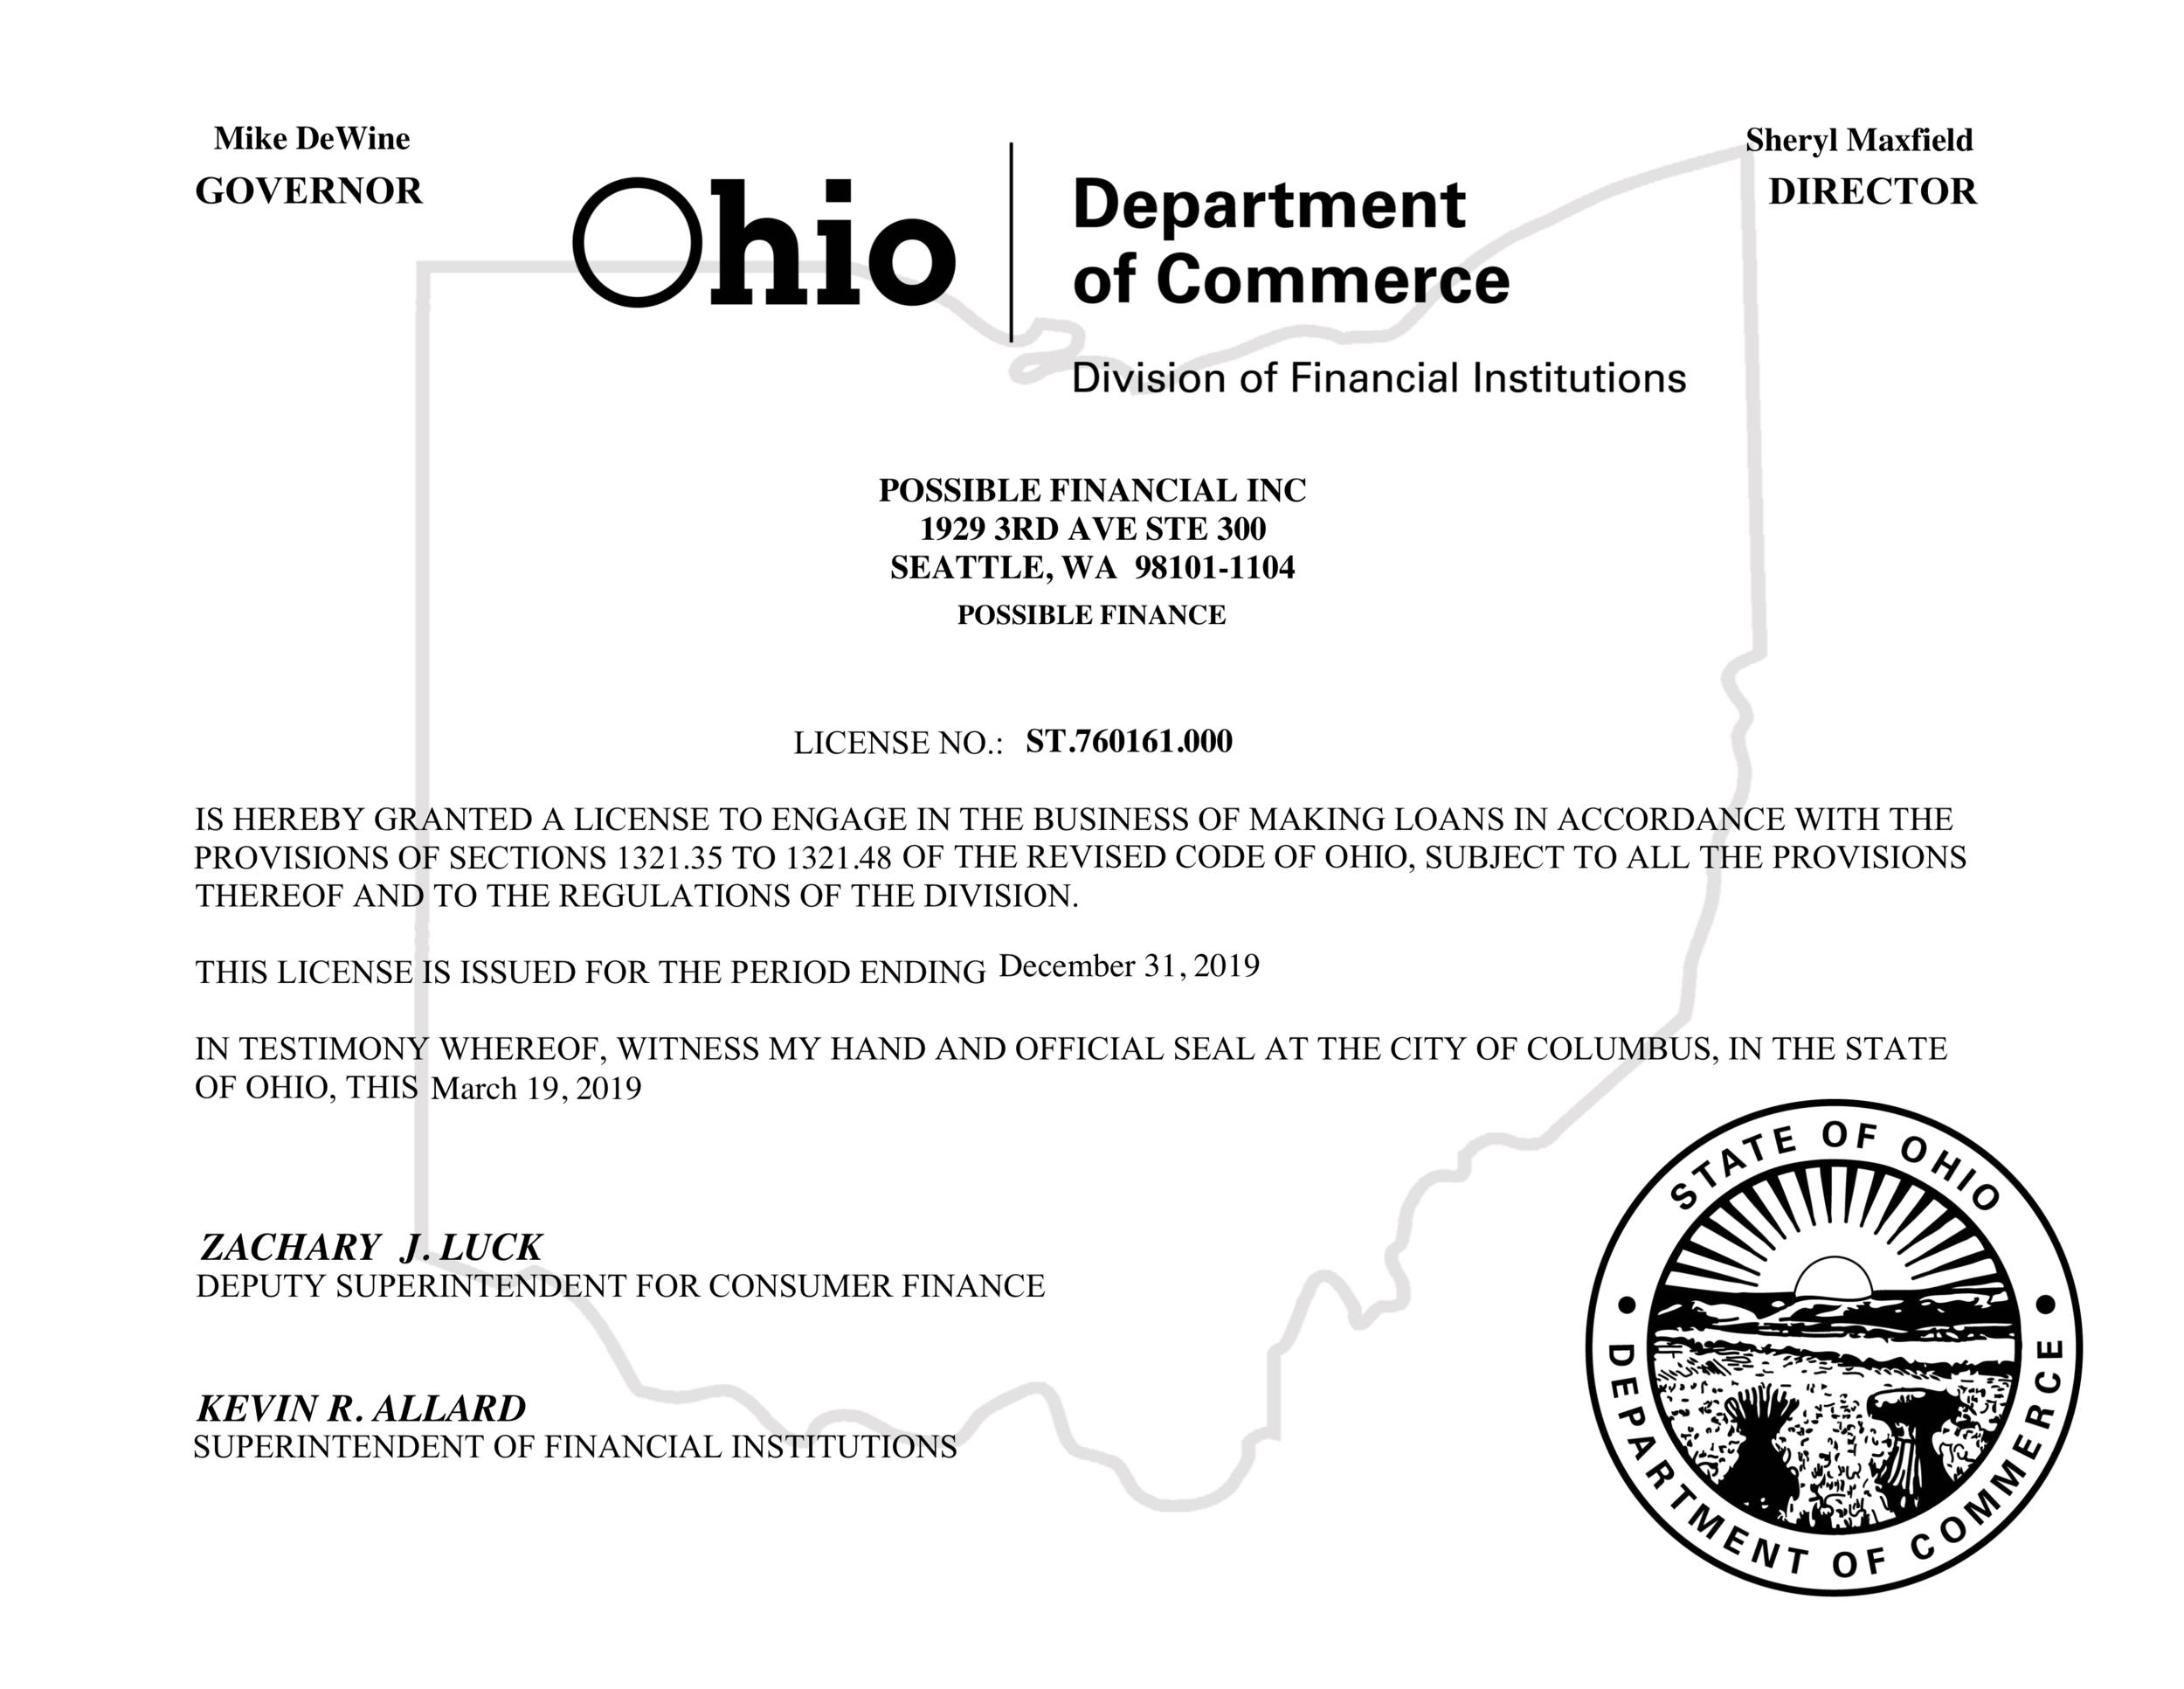 Ohio lending license for Possible Finance